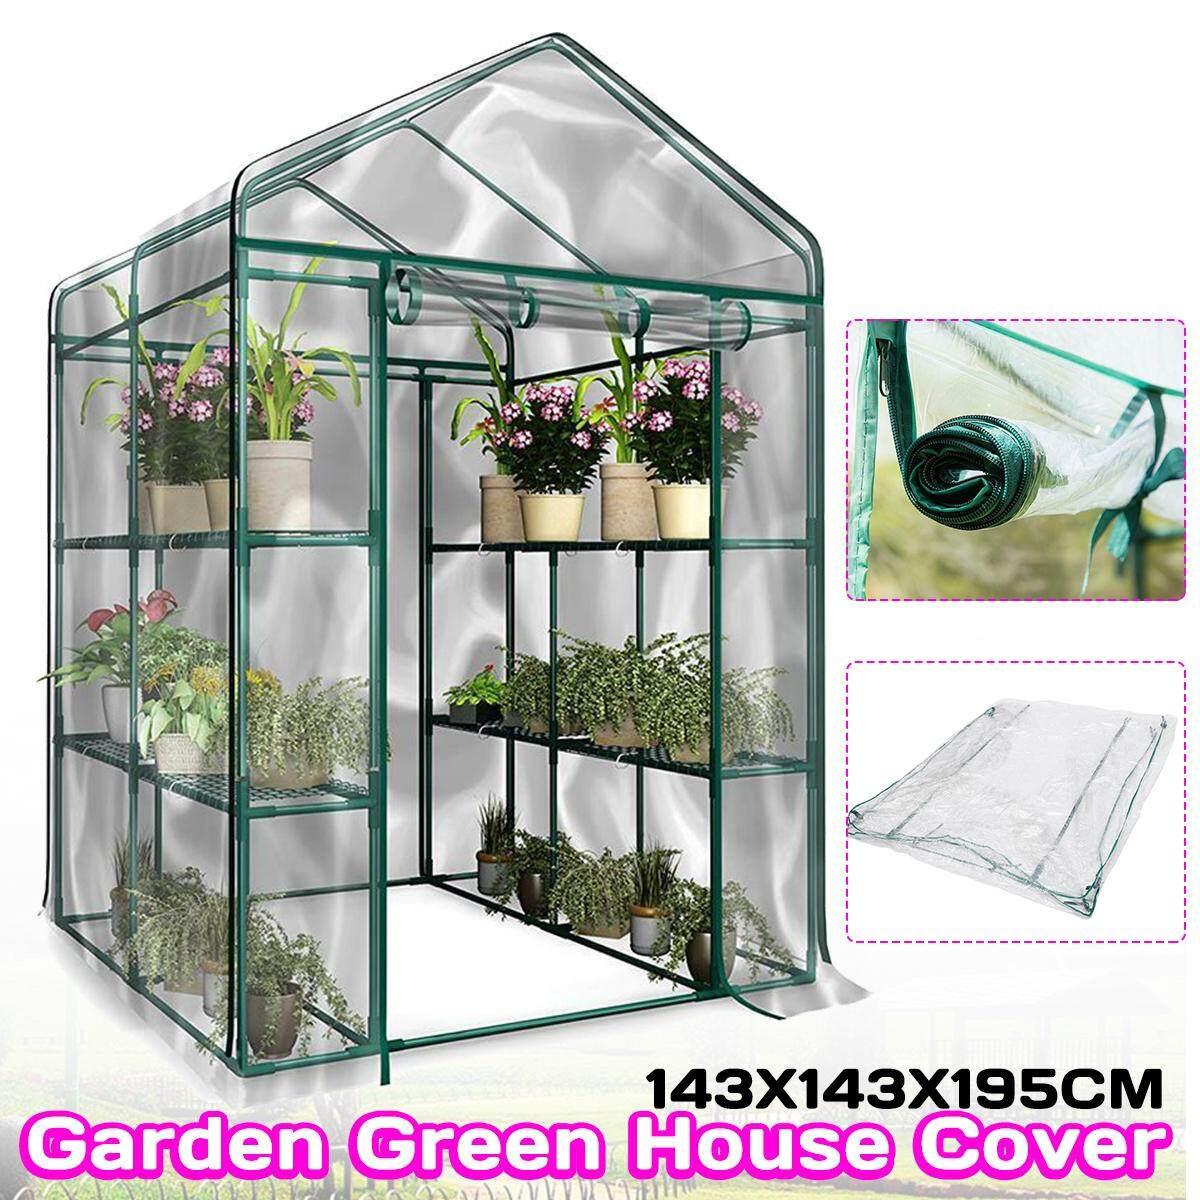 3-Tier Portable Greenhouse 6 Shelves PVC Cover Garden Cover Plants Flower House